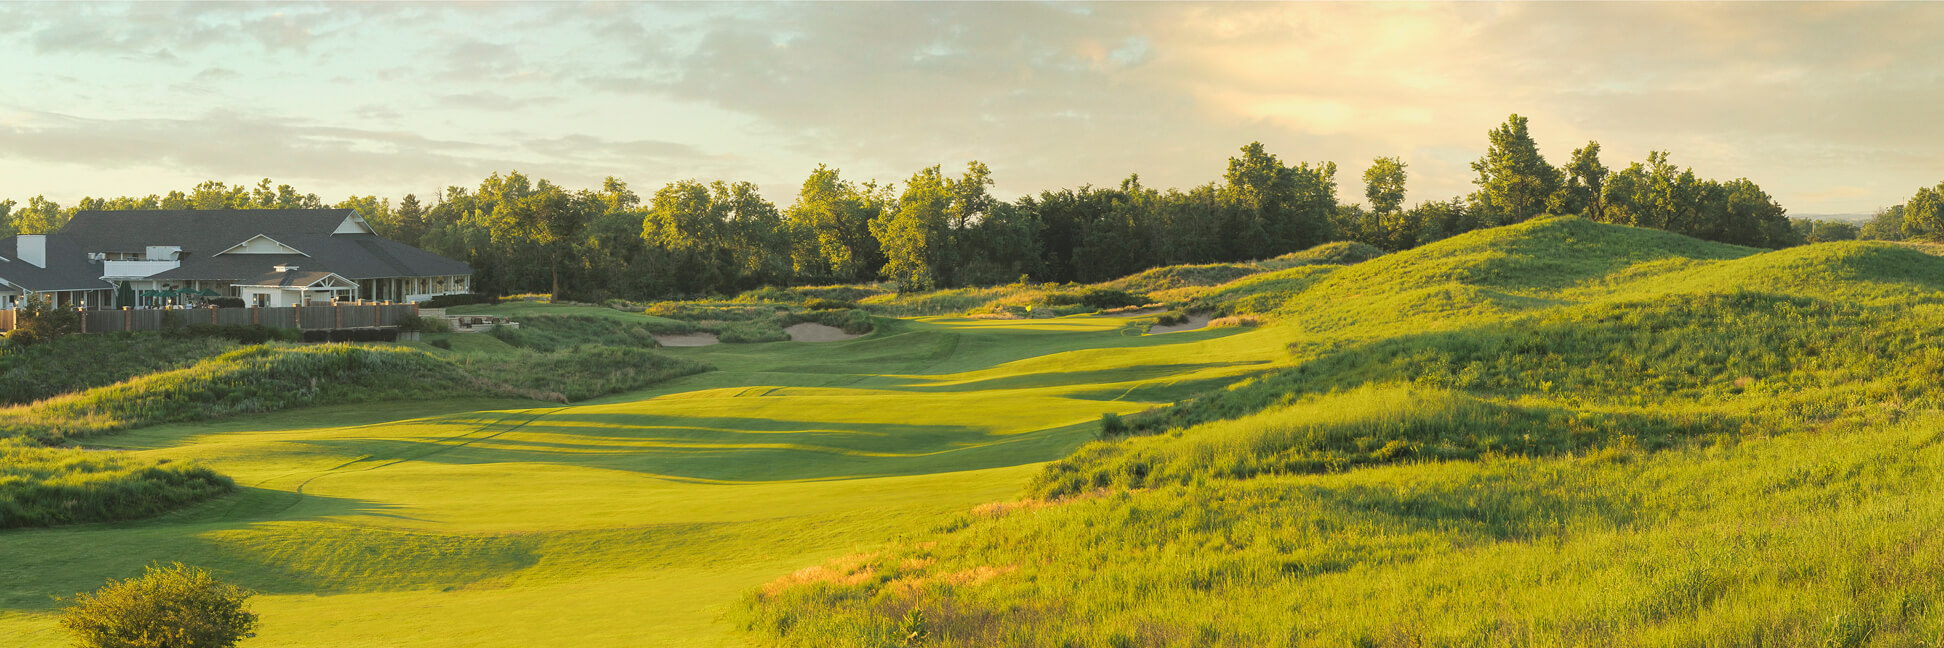 Golf Course Image - Prairie Dunes Country Club No. 18